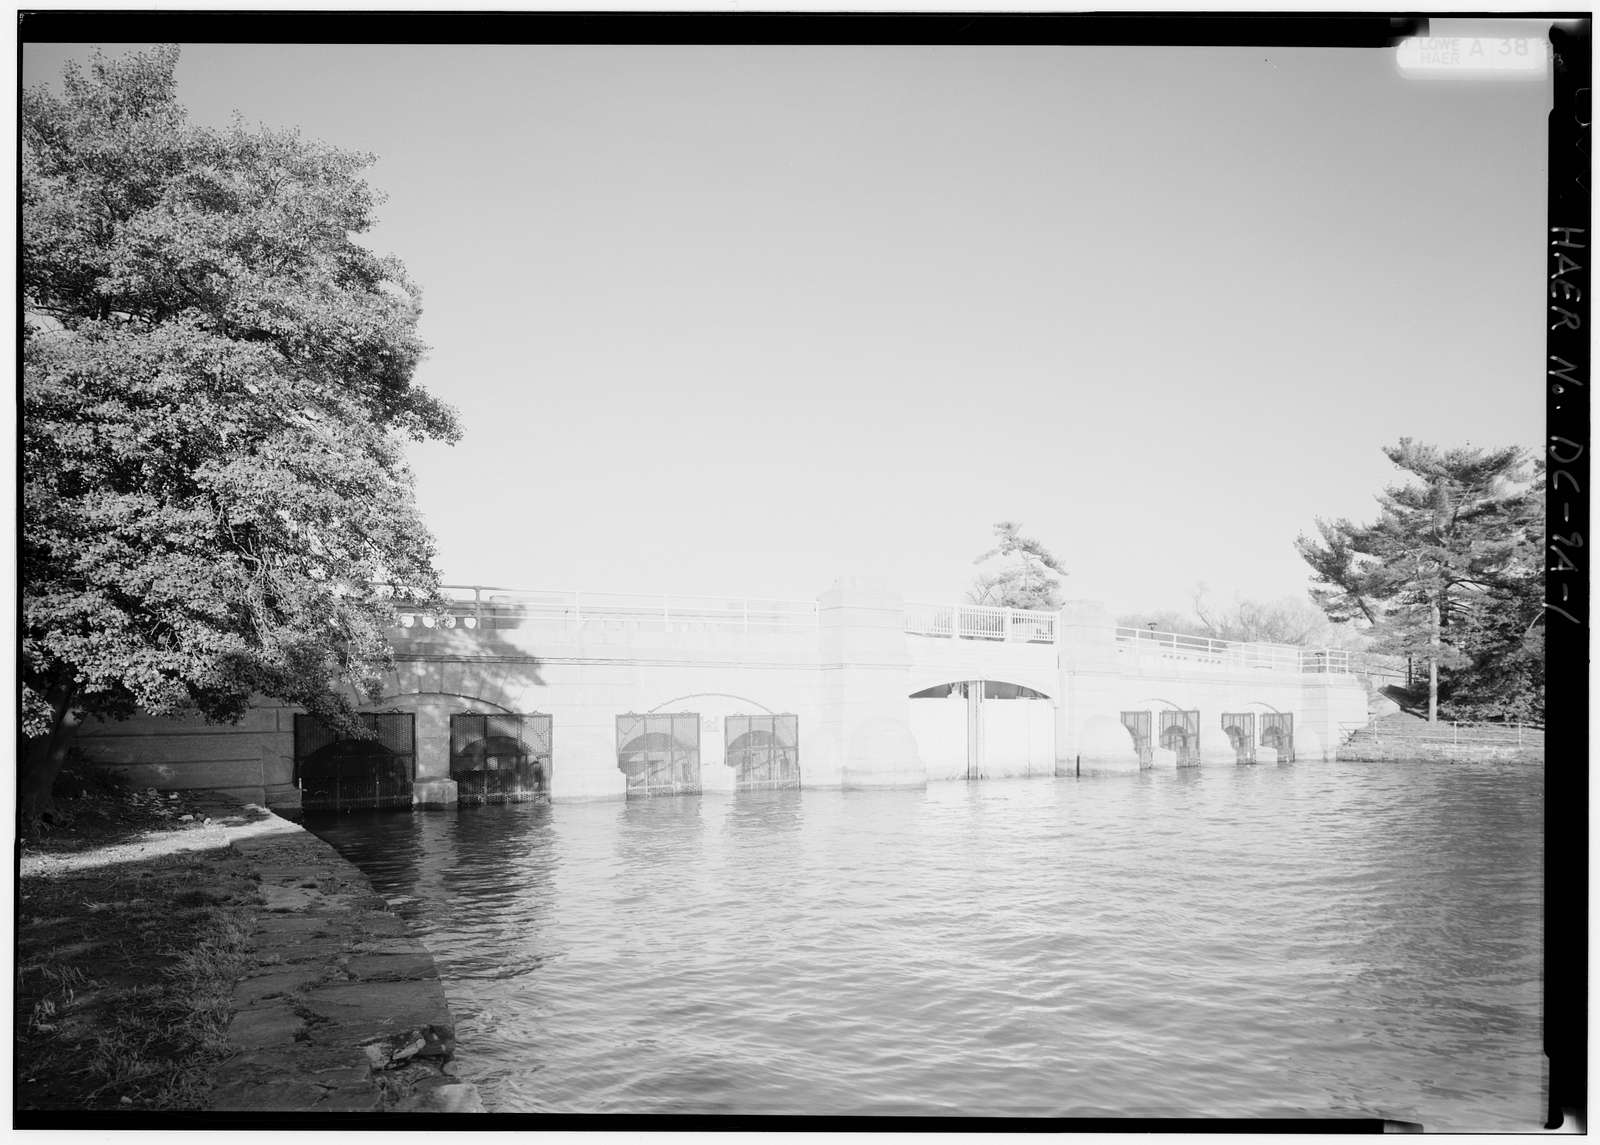 Tidal Reservoir, Inlet Bridge, Ohio Drive, spanning Inlet of Tidal Basin, Washington, District of Columbia, DC